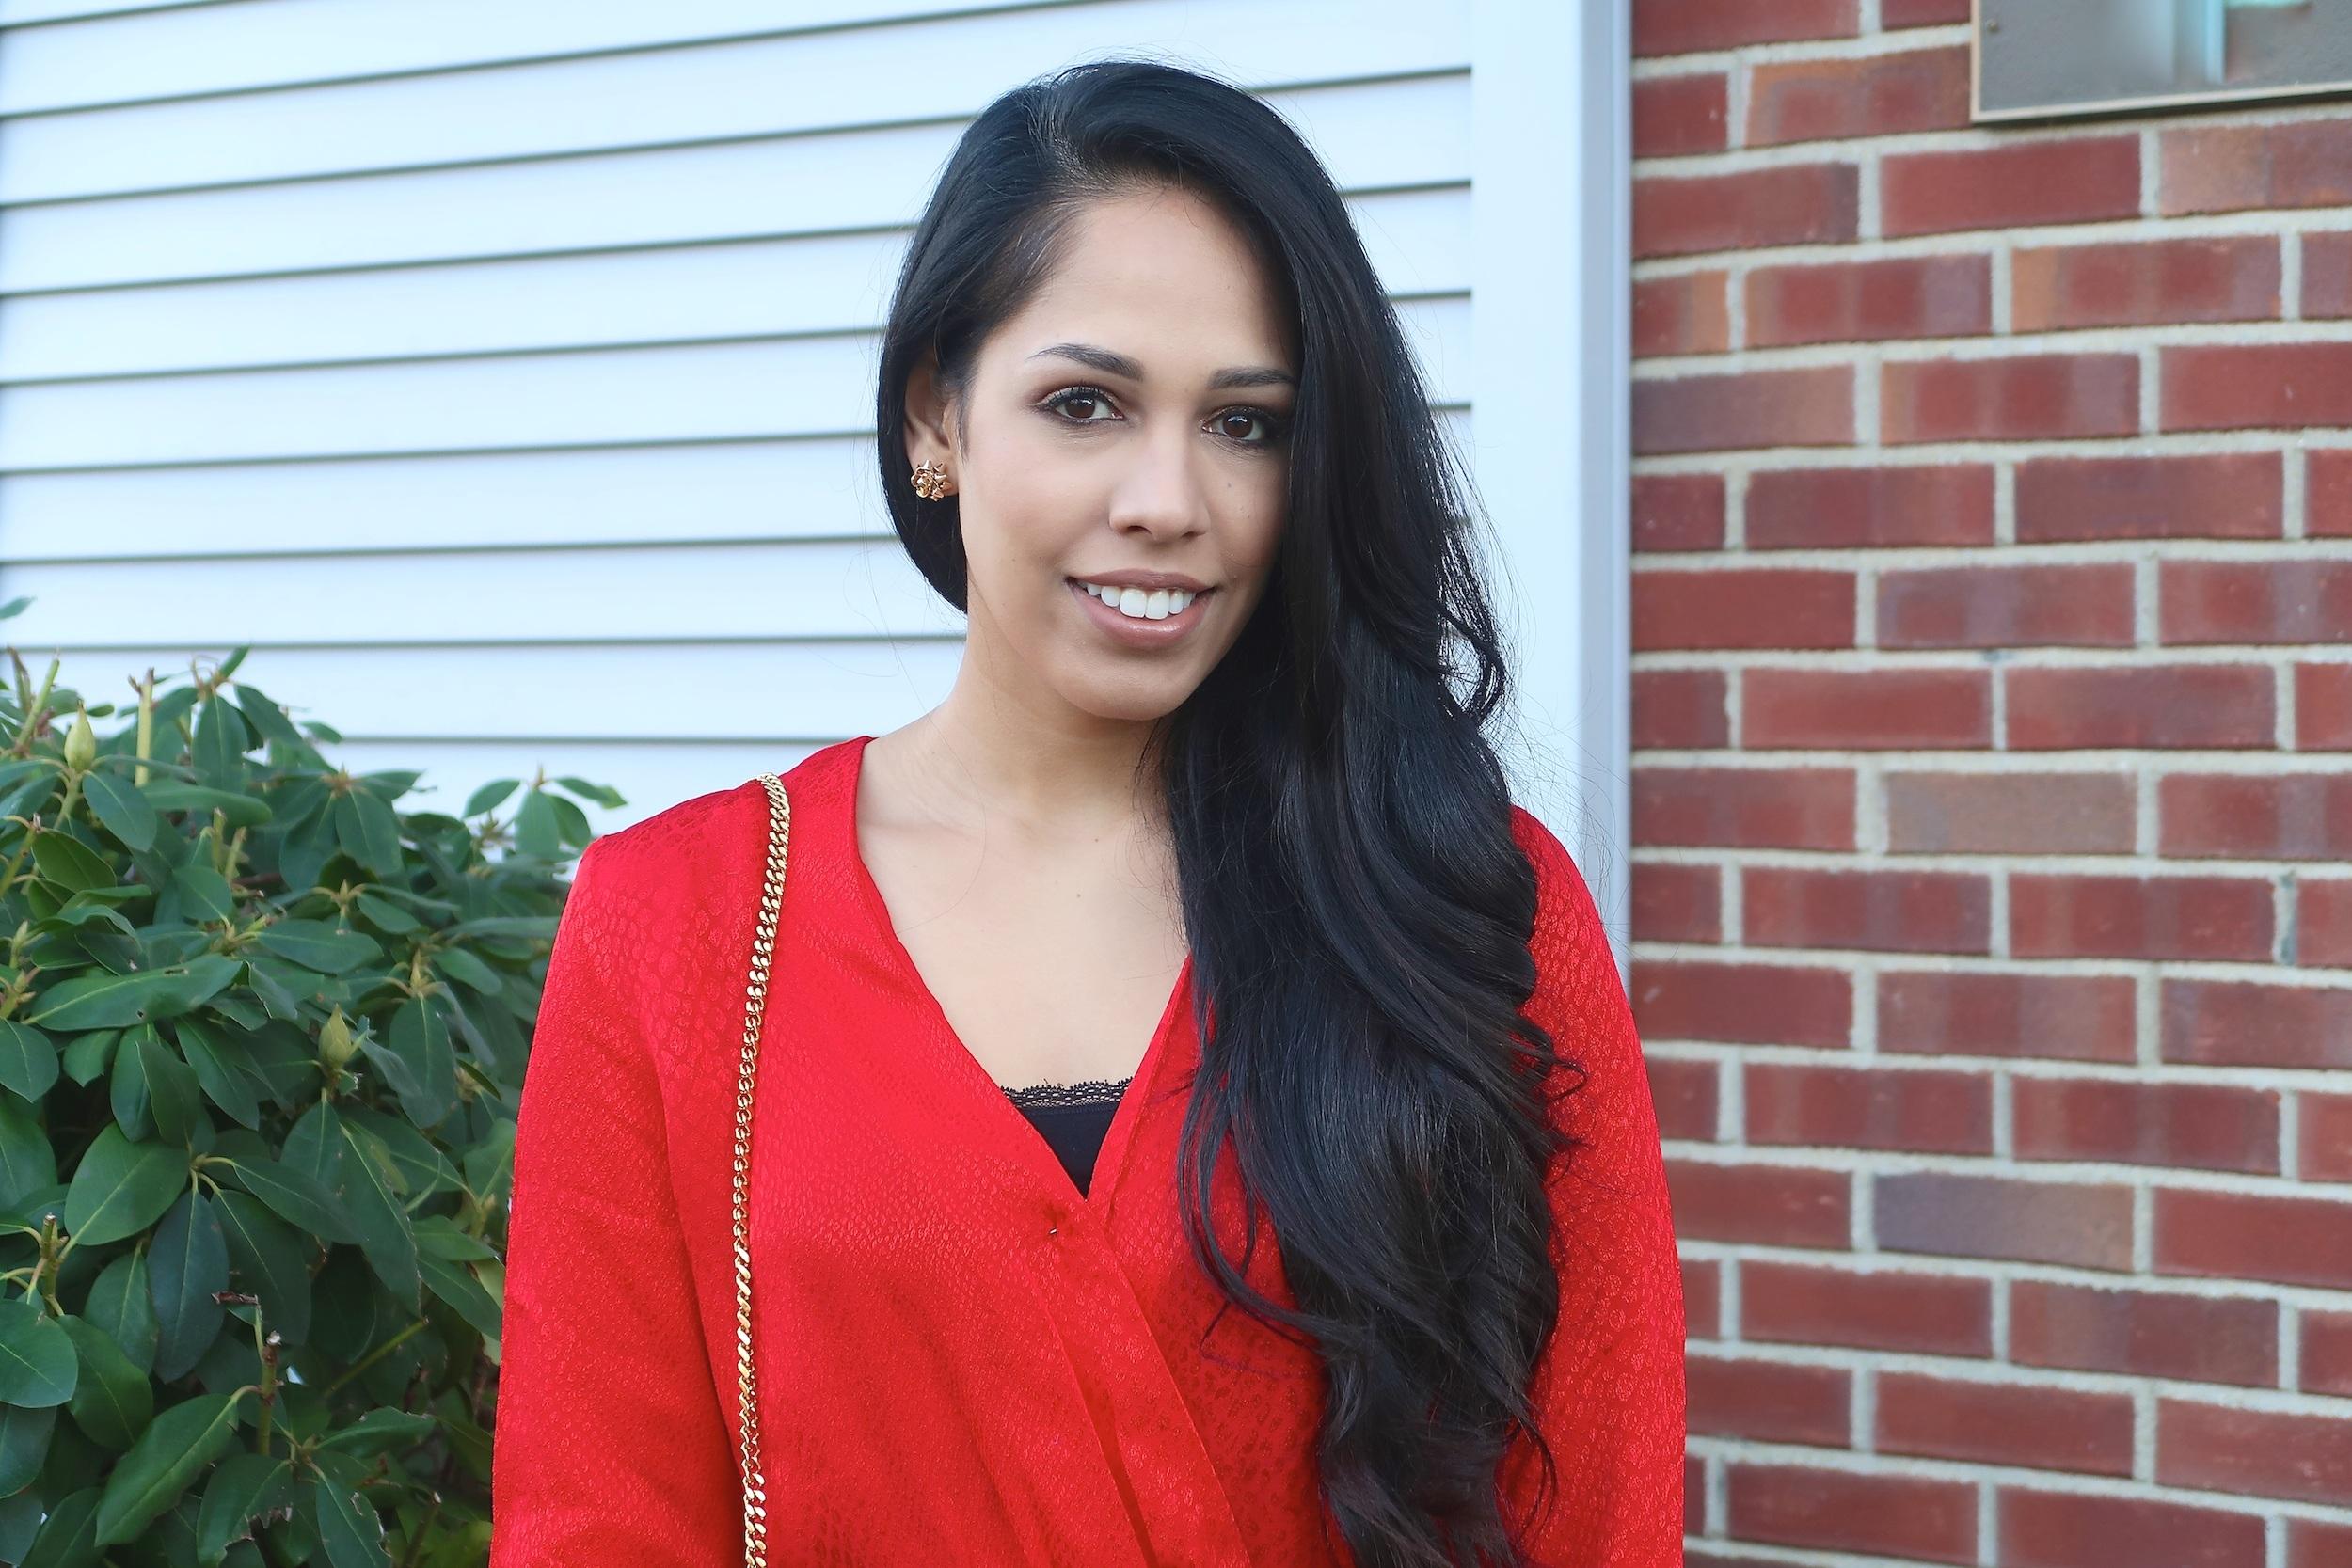 fashion-blogger-red-dress-christmas-outift-idea.jpg